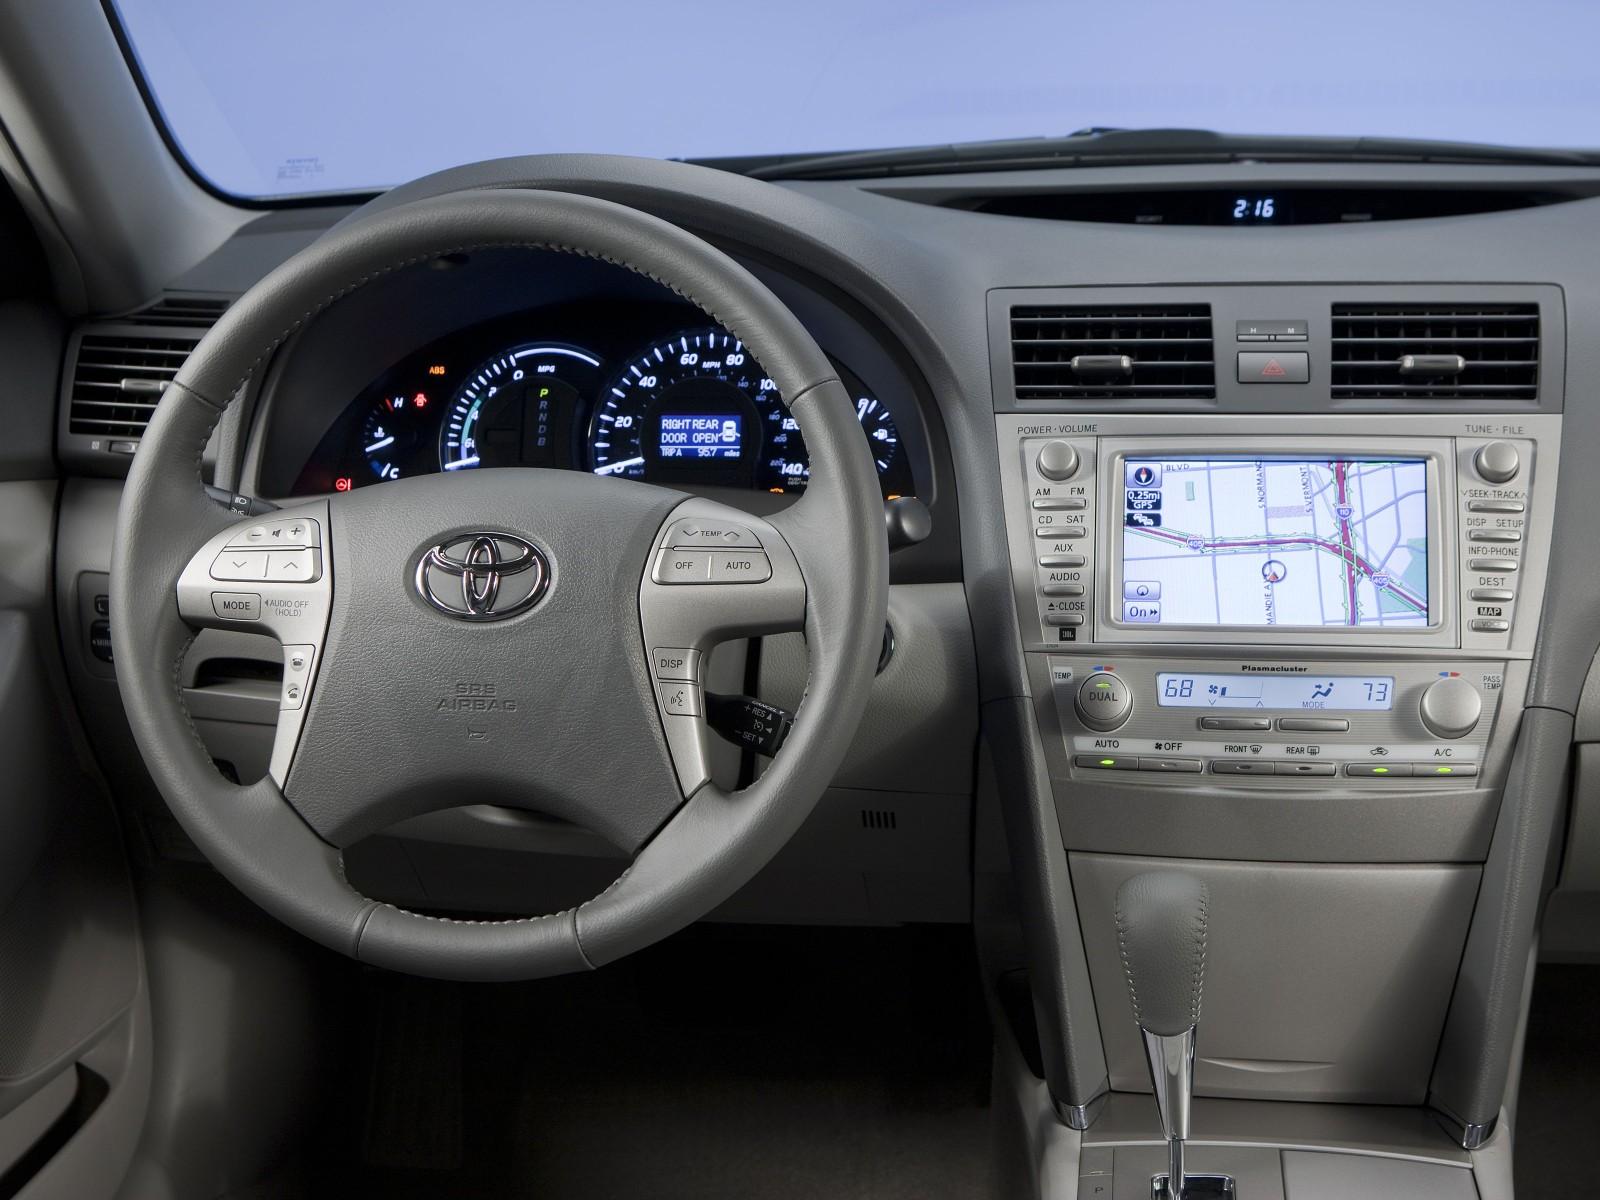 Toyota Camry Hybrid X on 2006 Hyundai Santa Fe Fuse Box